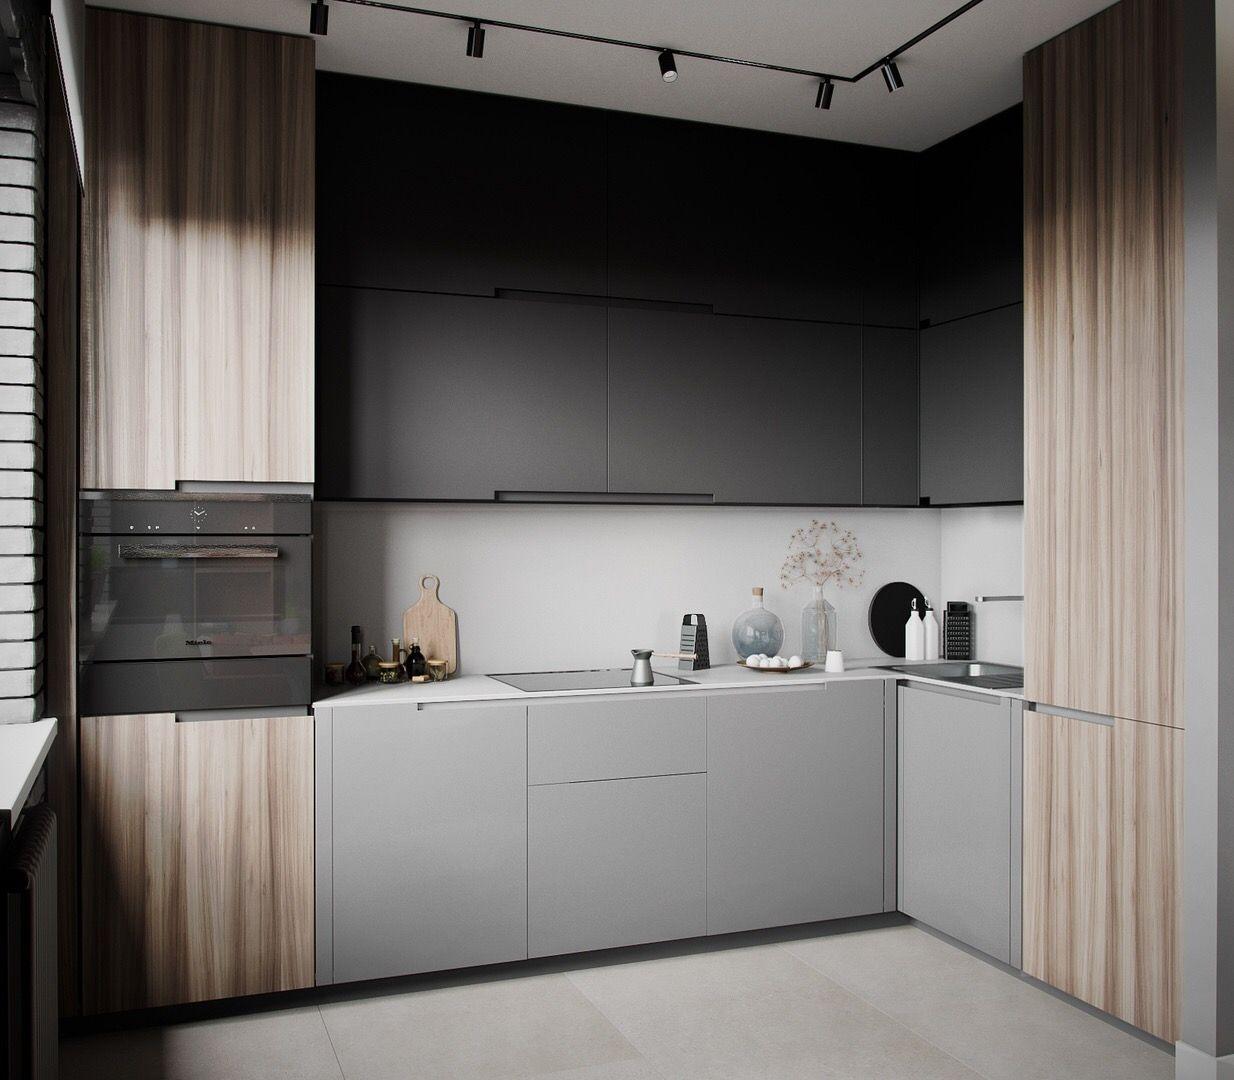 Küchendesignhaus pin von gabor balatoni auf lakberendezés  pinterest